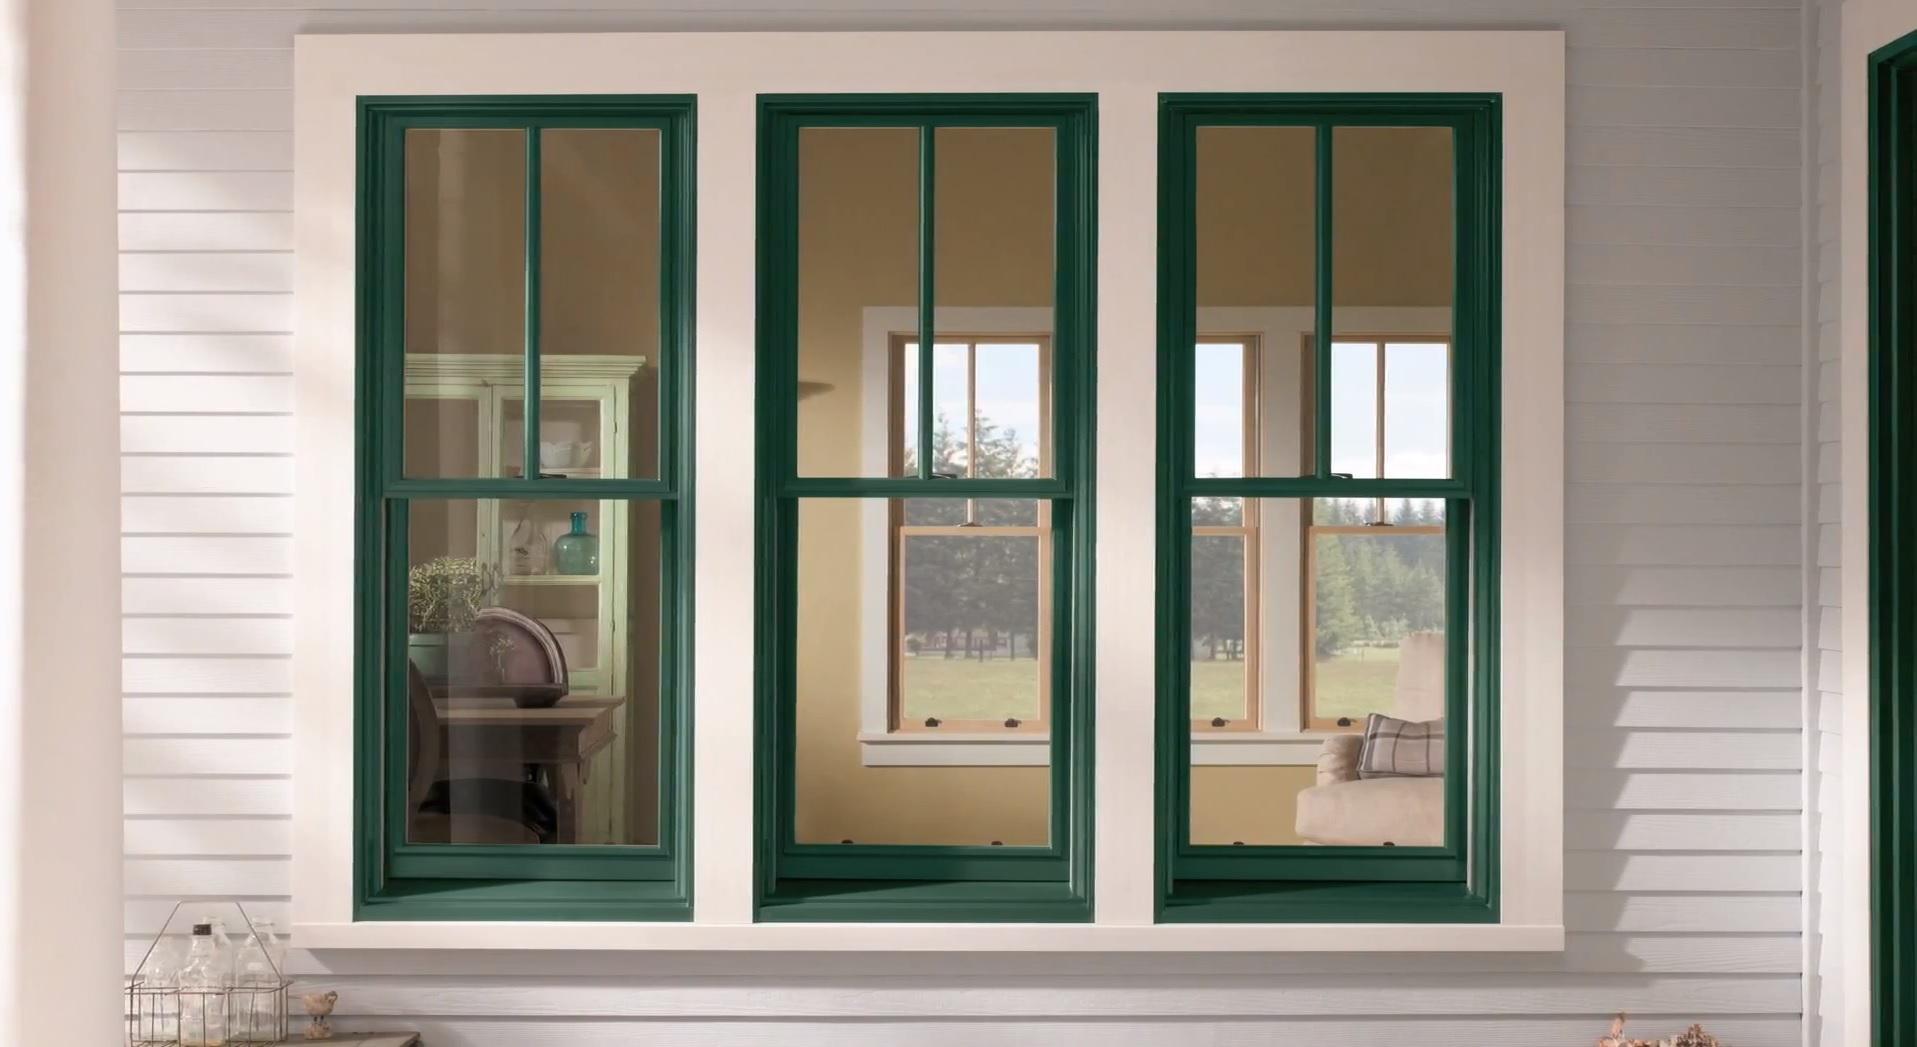 Retrofit Home Windows a Full Service Retrofit Window